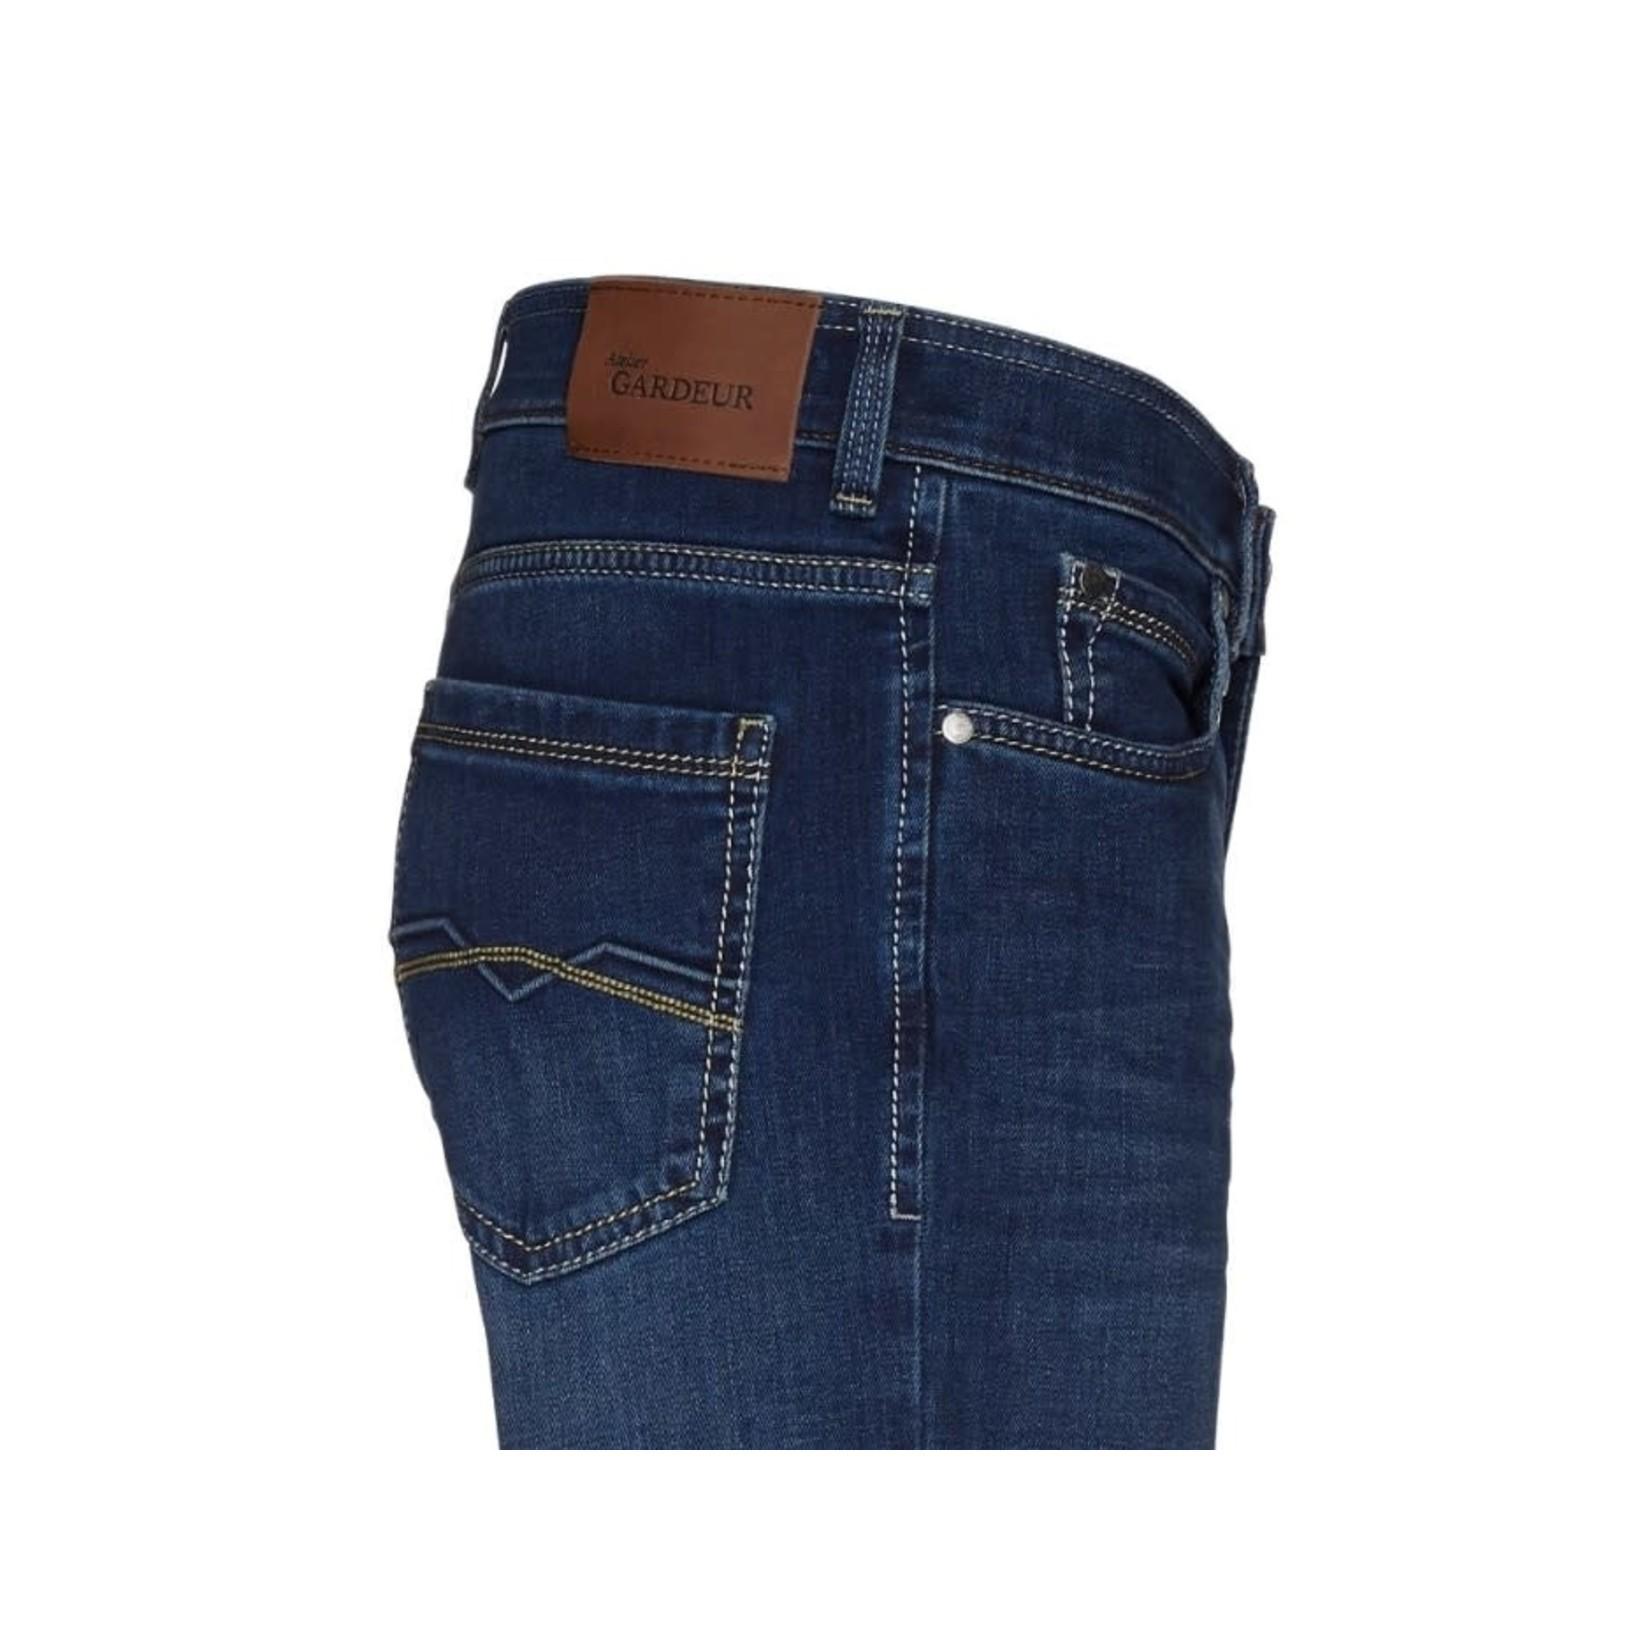 Gardeur Batu-2 modern fit jeans middenblauw 71001-068